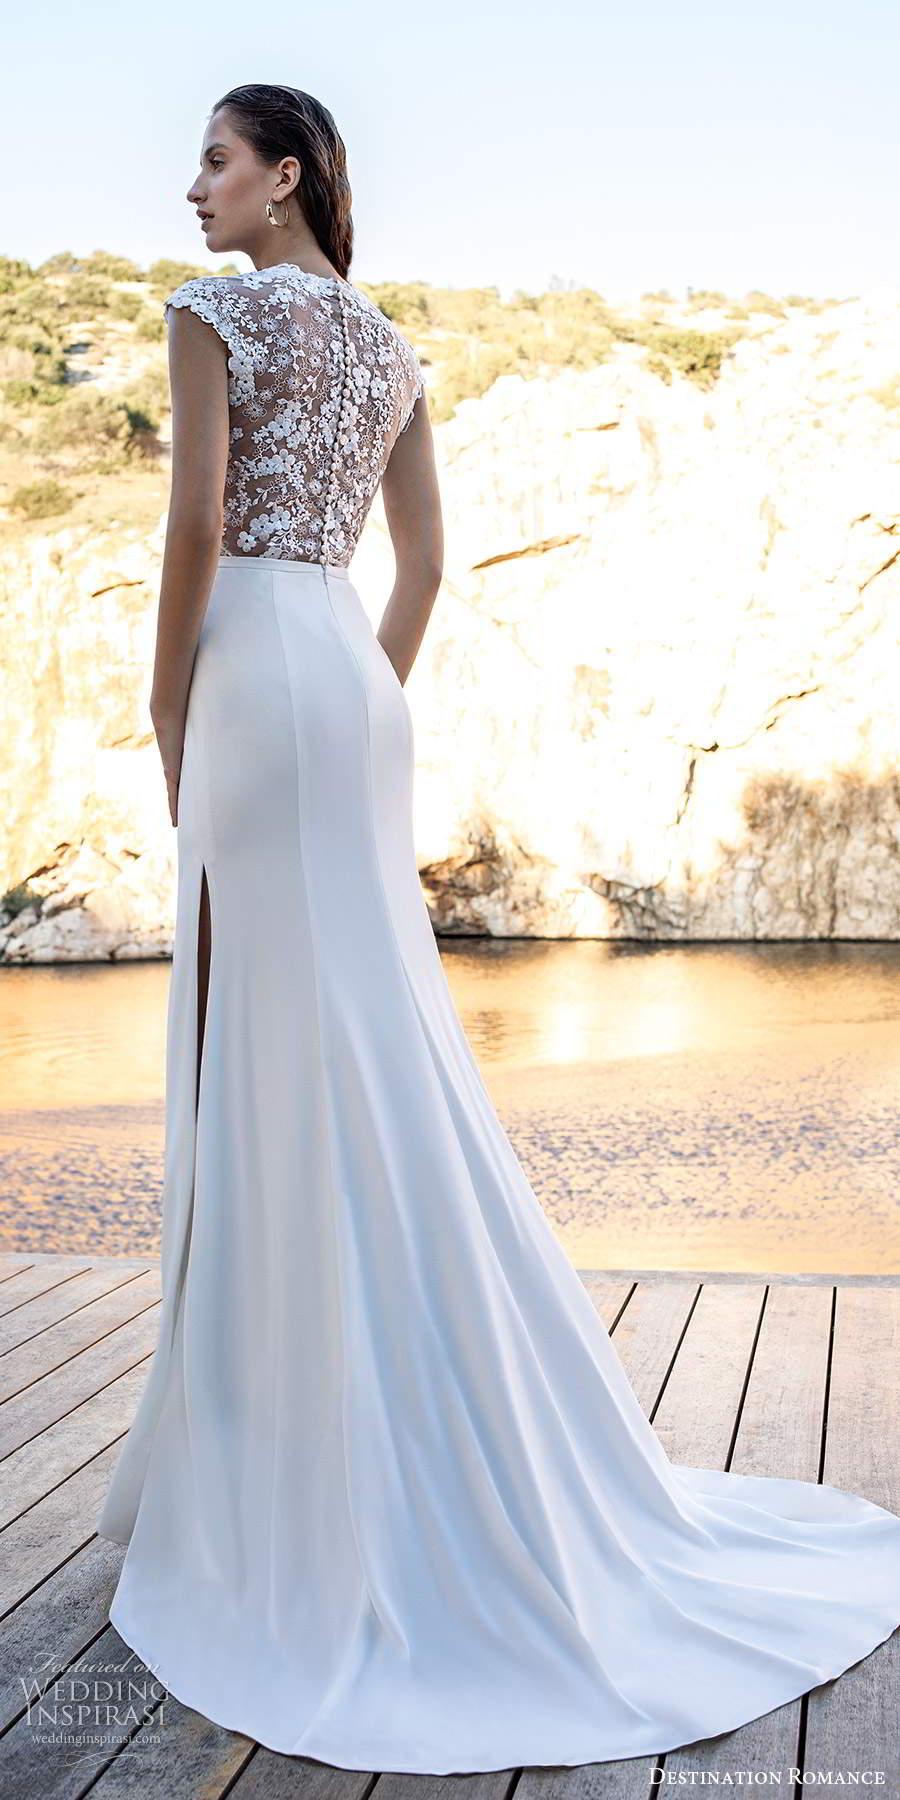 destination romance 2020 bridal cap sleeves jewel neckline lace bodice clean skirt sheath column wedding dress chapel train (14) bv